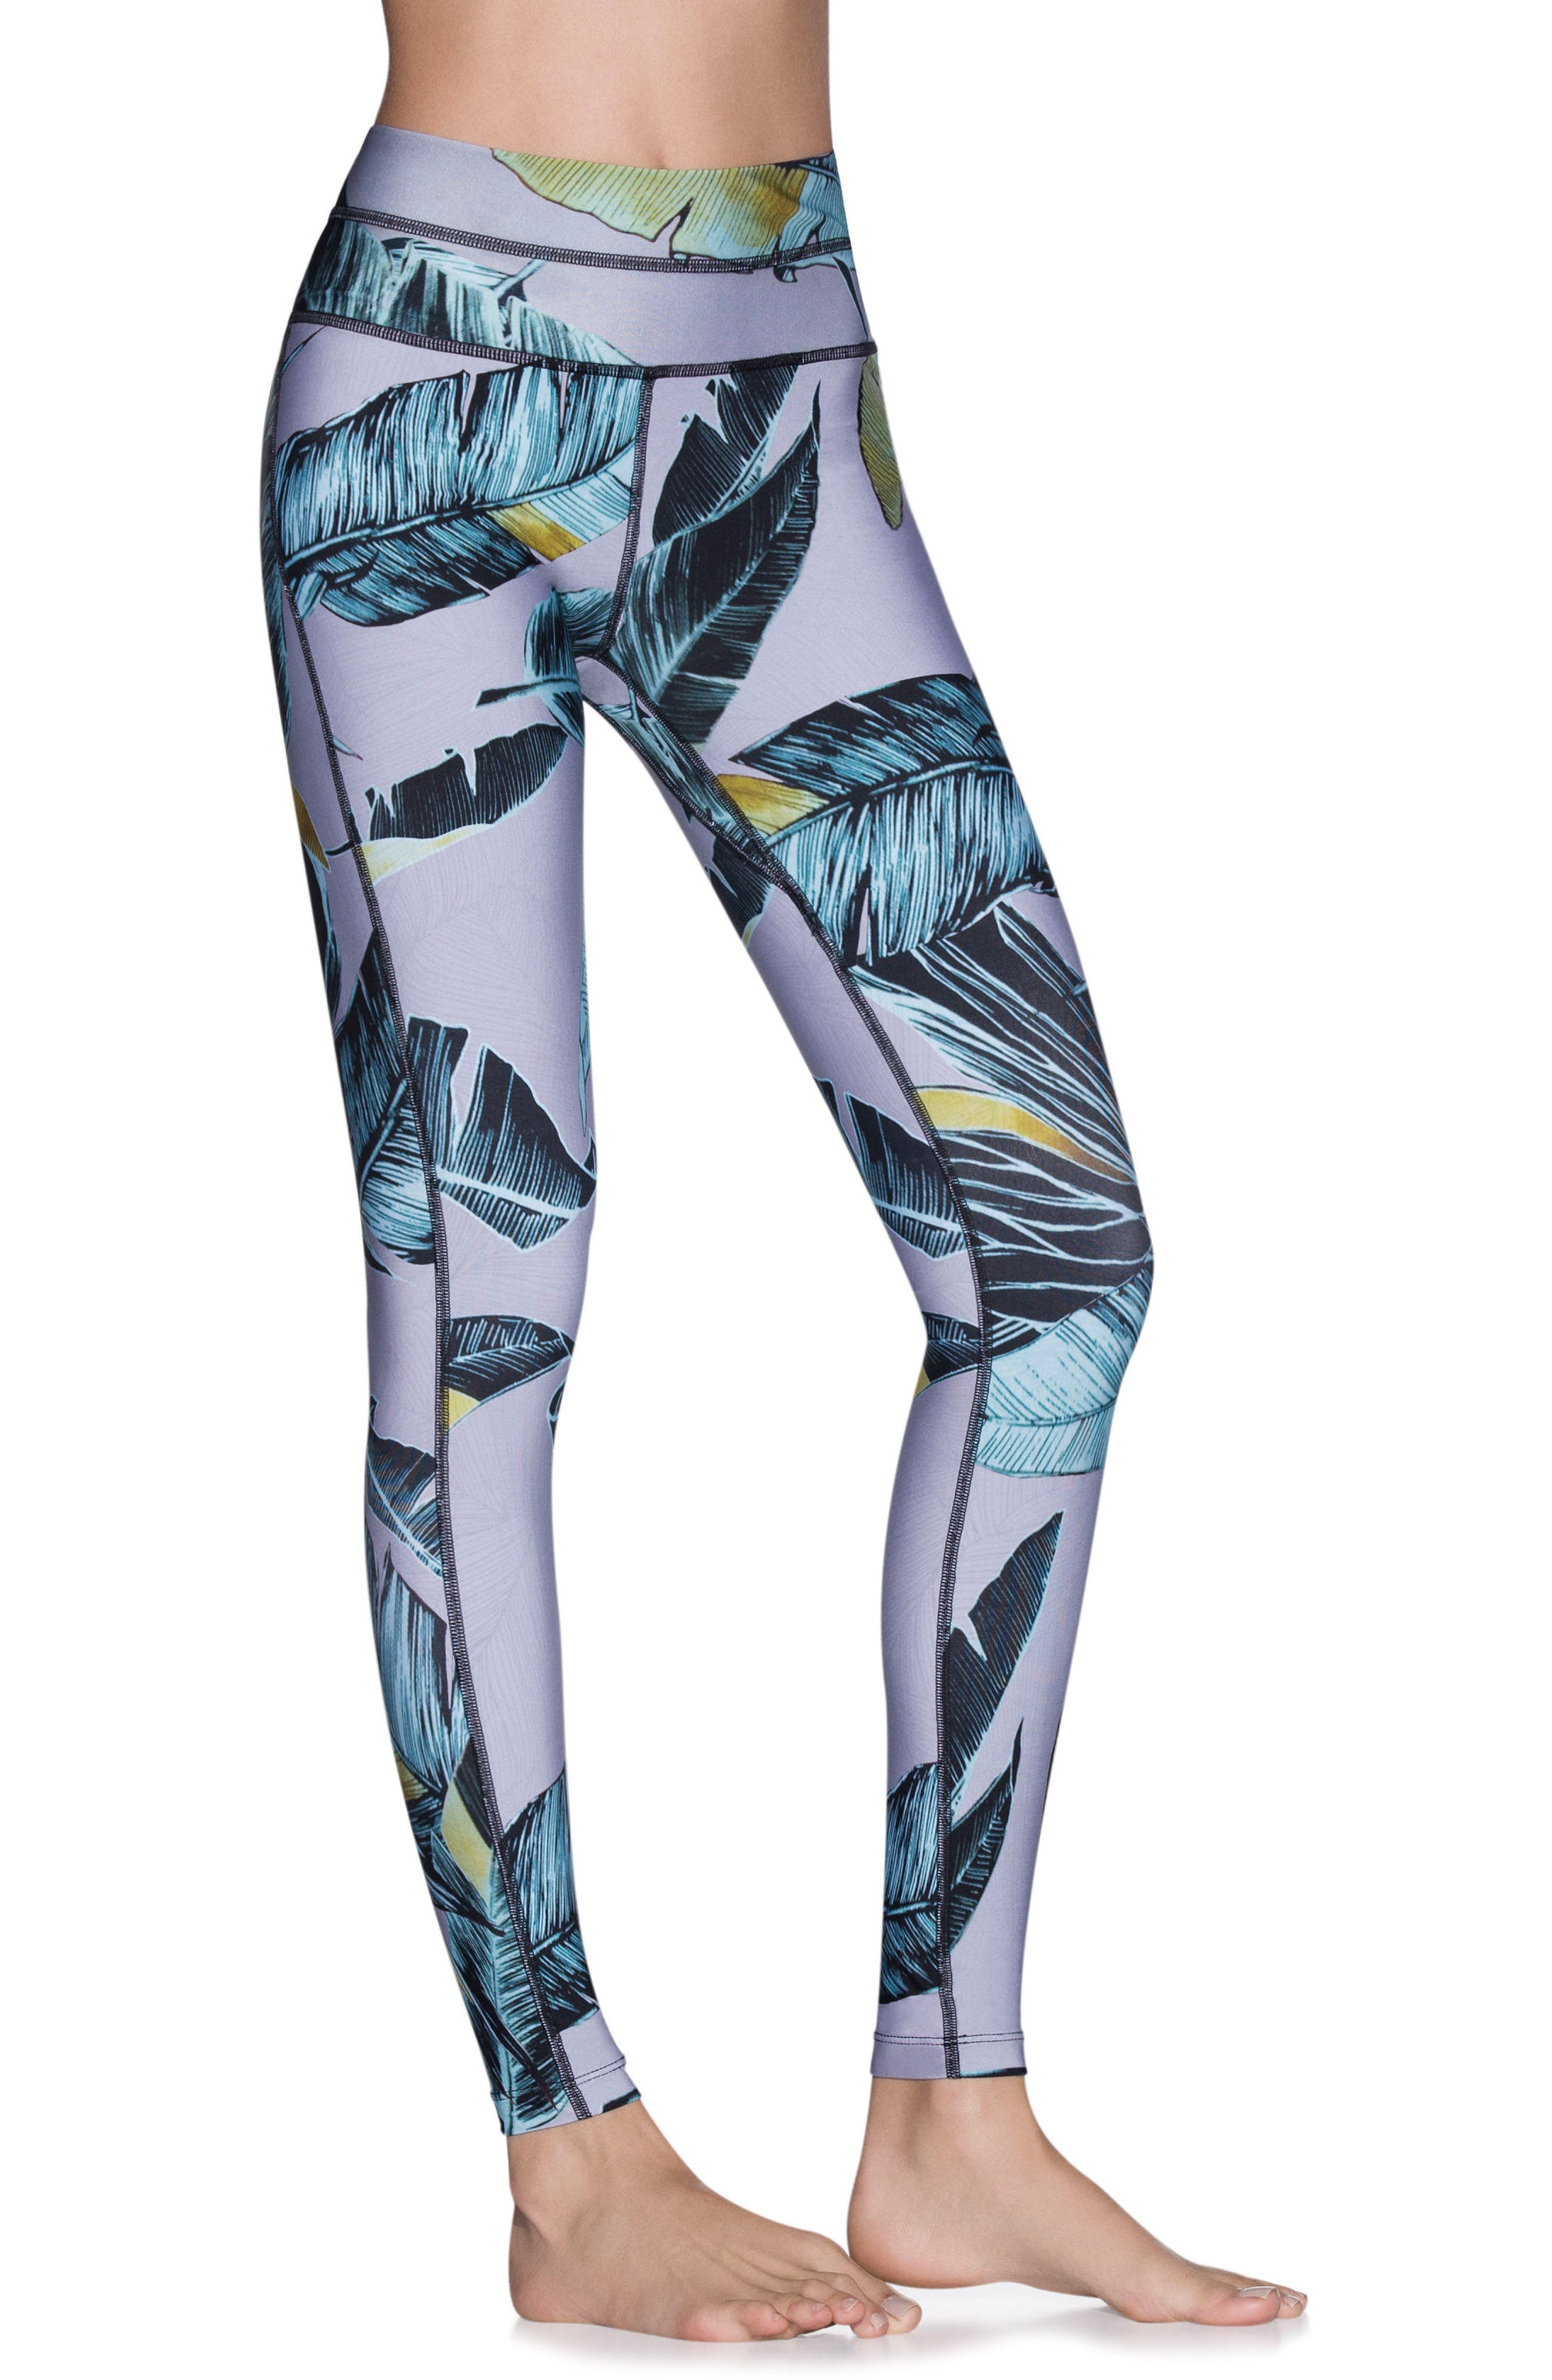 Dazzling Tropic Leggings,                             Main thumbnail 1, color,                             Multicolor